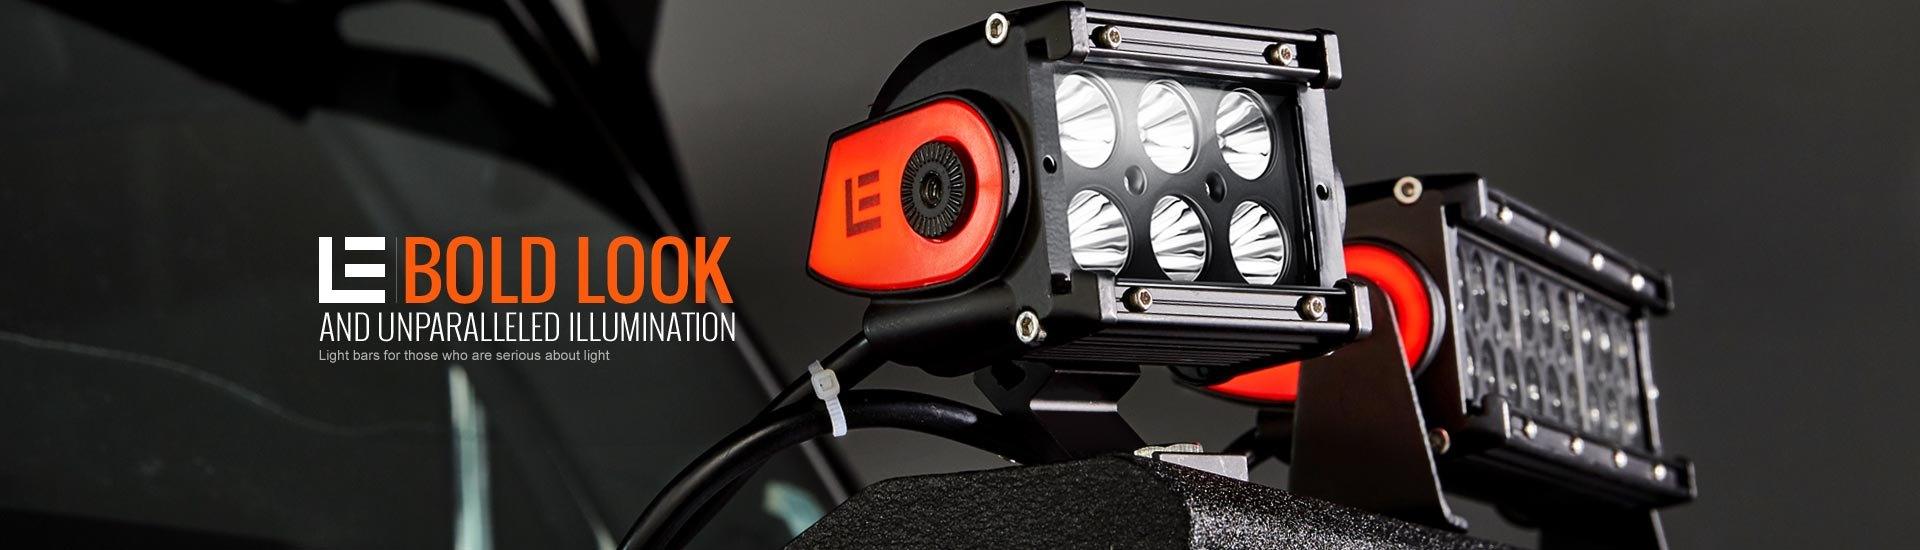 Automotive Lighting Headlights Tail Lights Leds Bulbs 95 Accord Wiring Harness 4 11